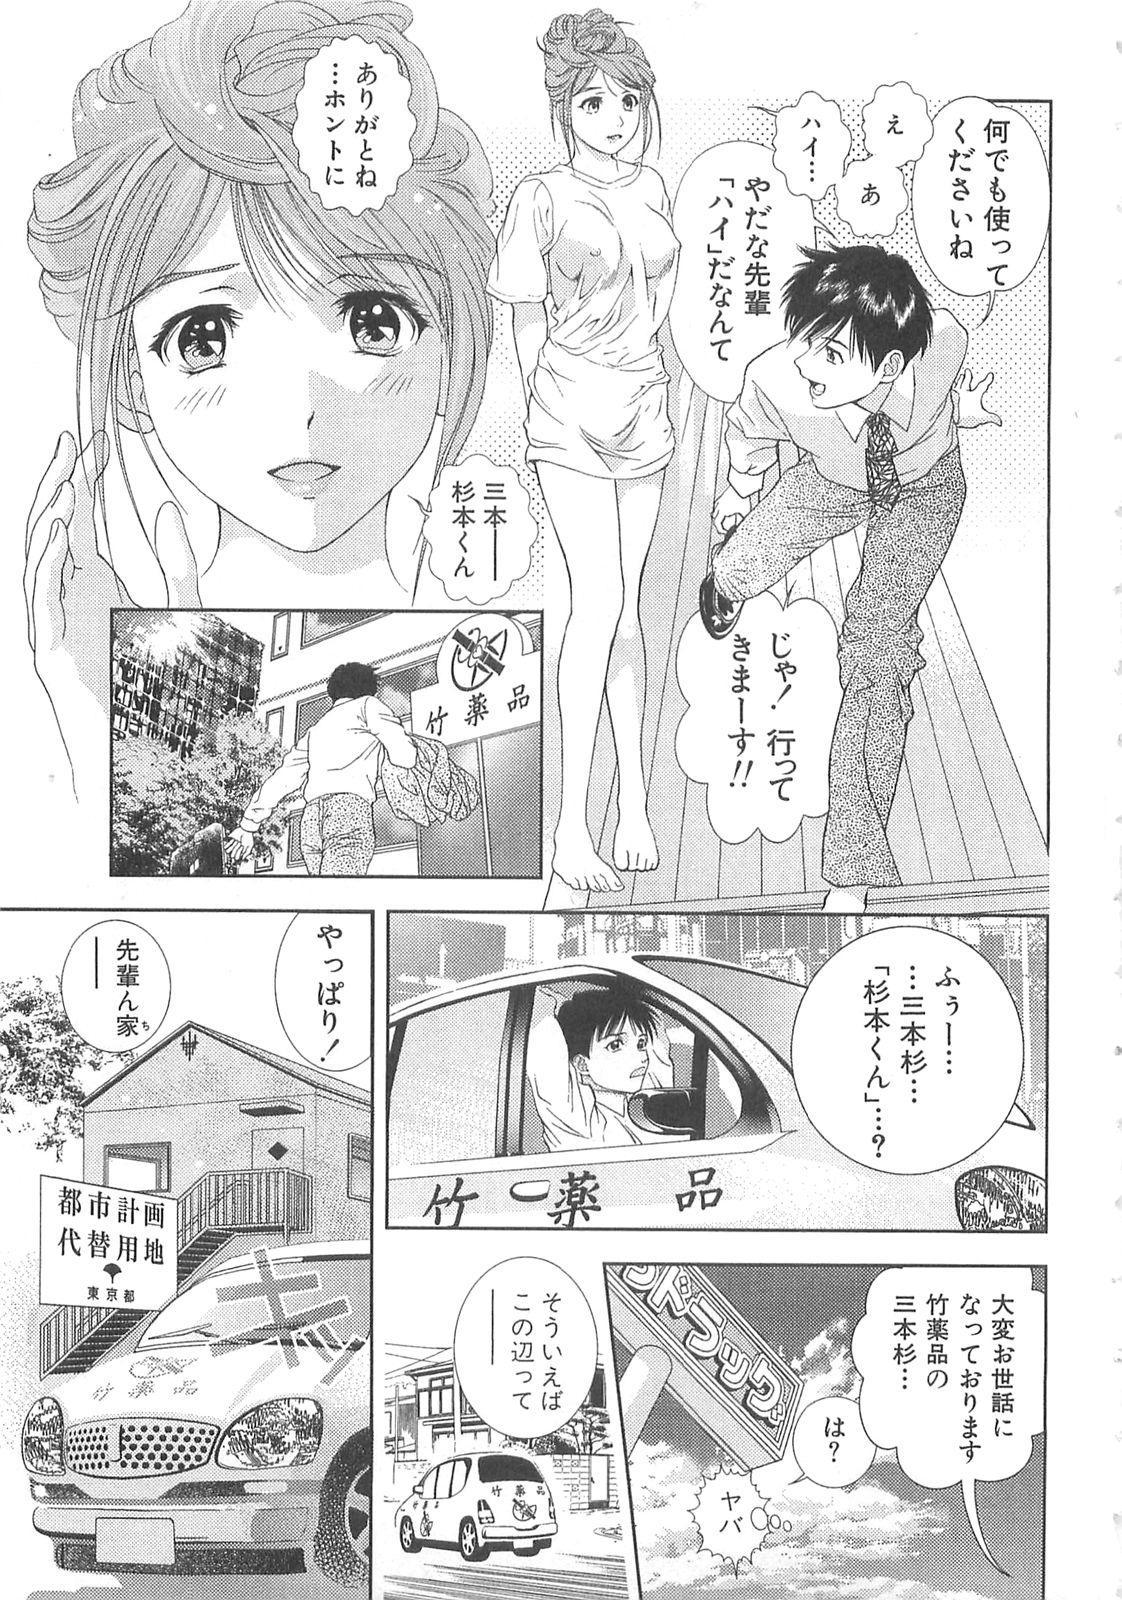 Tenshi no Kyuu - Angel's Pretty Hip 197